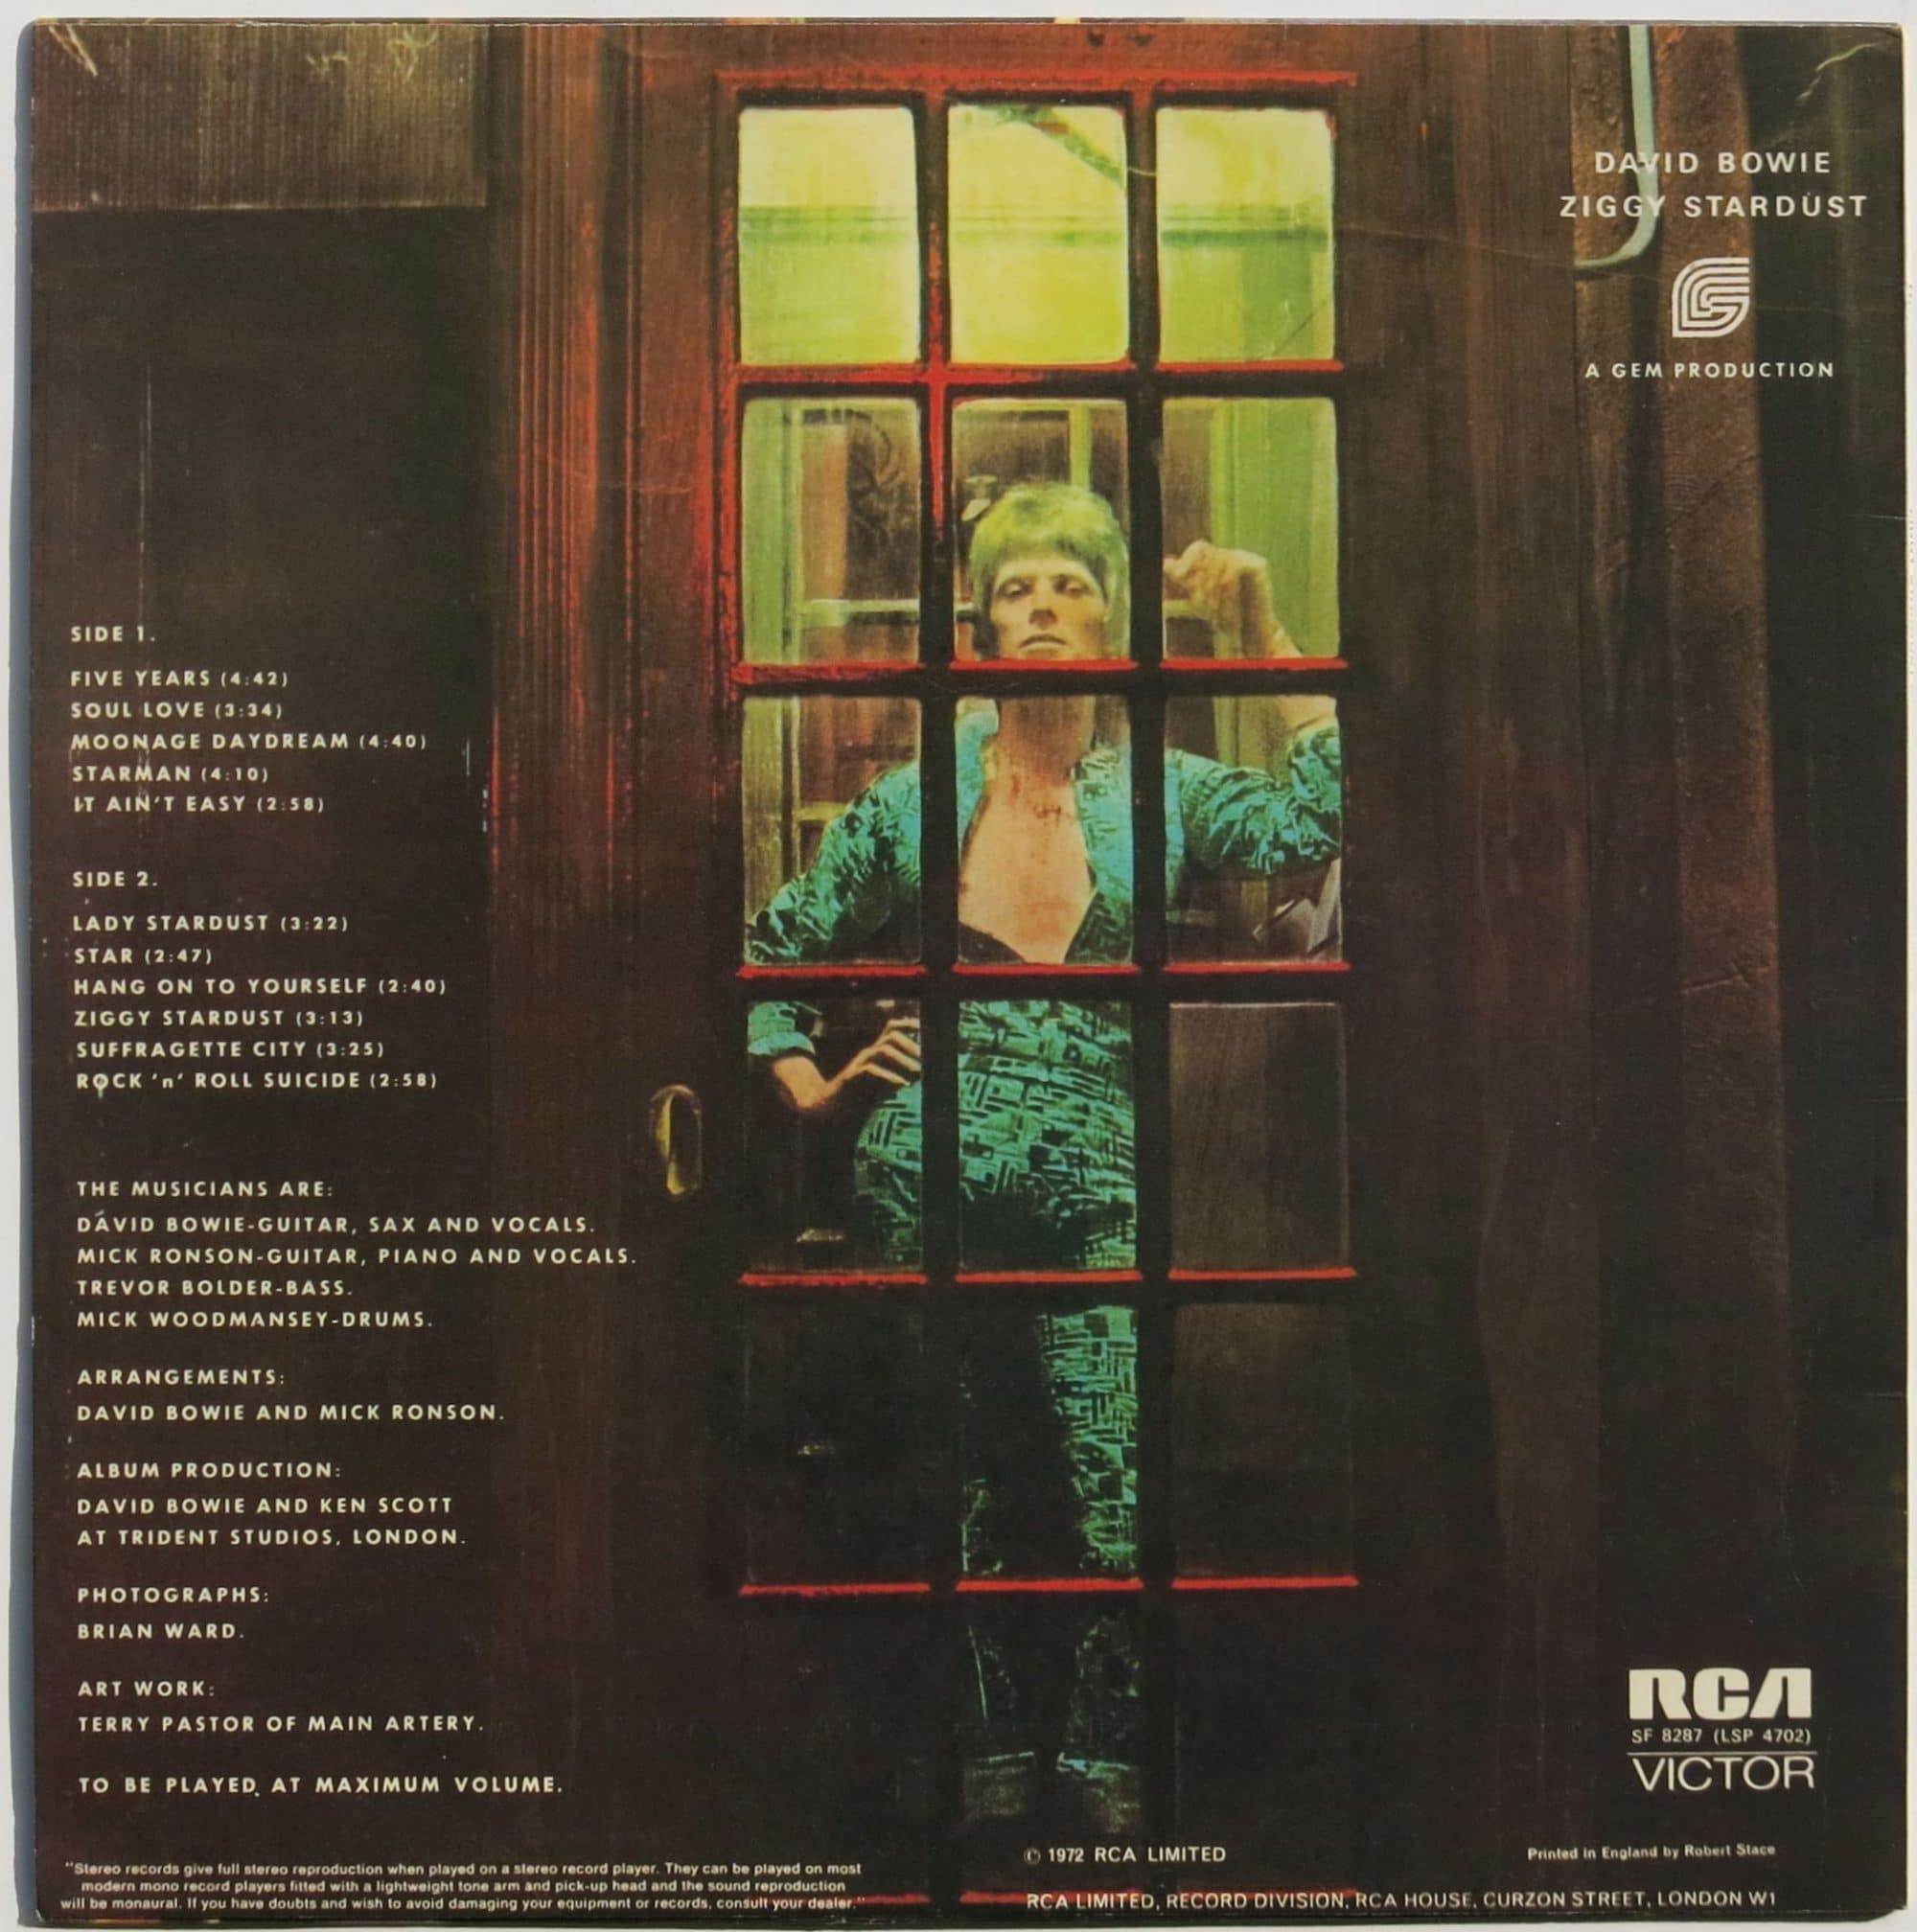 David Bowie Mint Uk 1st Pressing Ziggy Stardust Lp